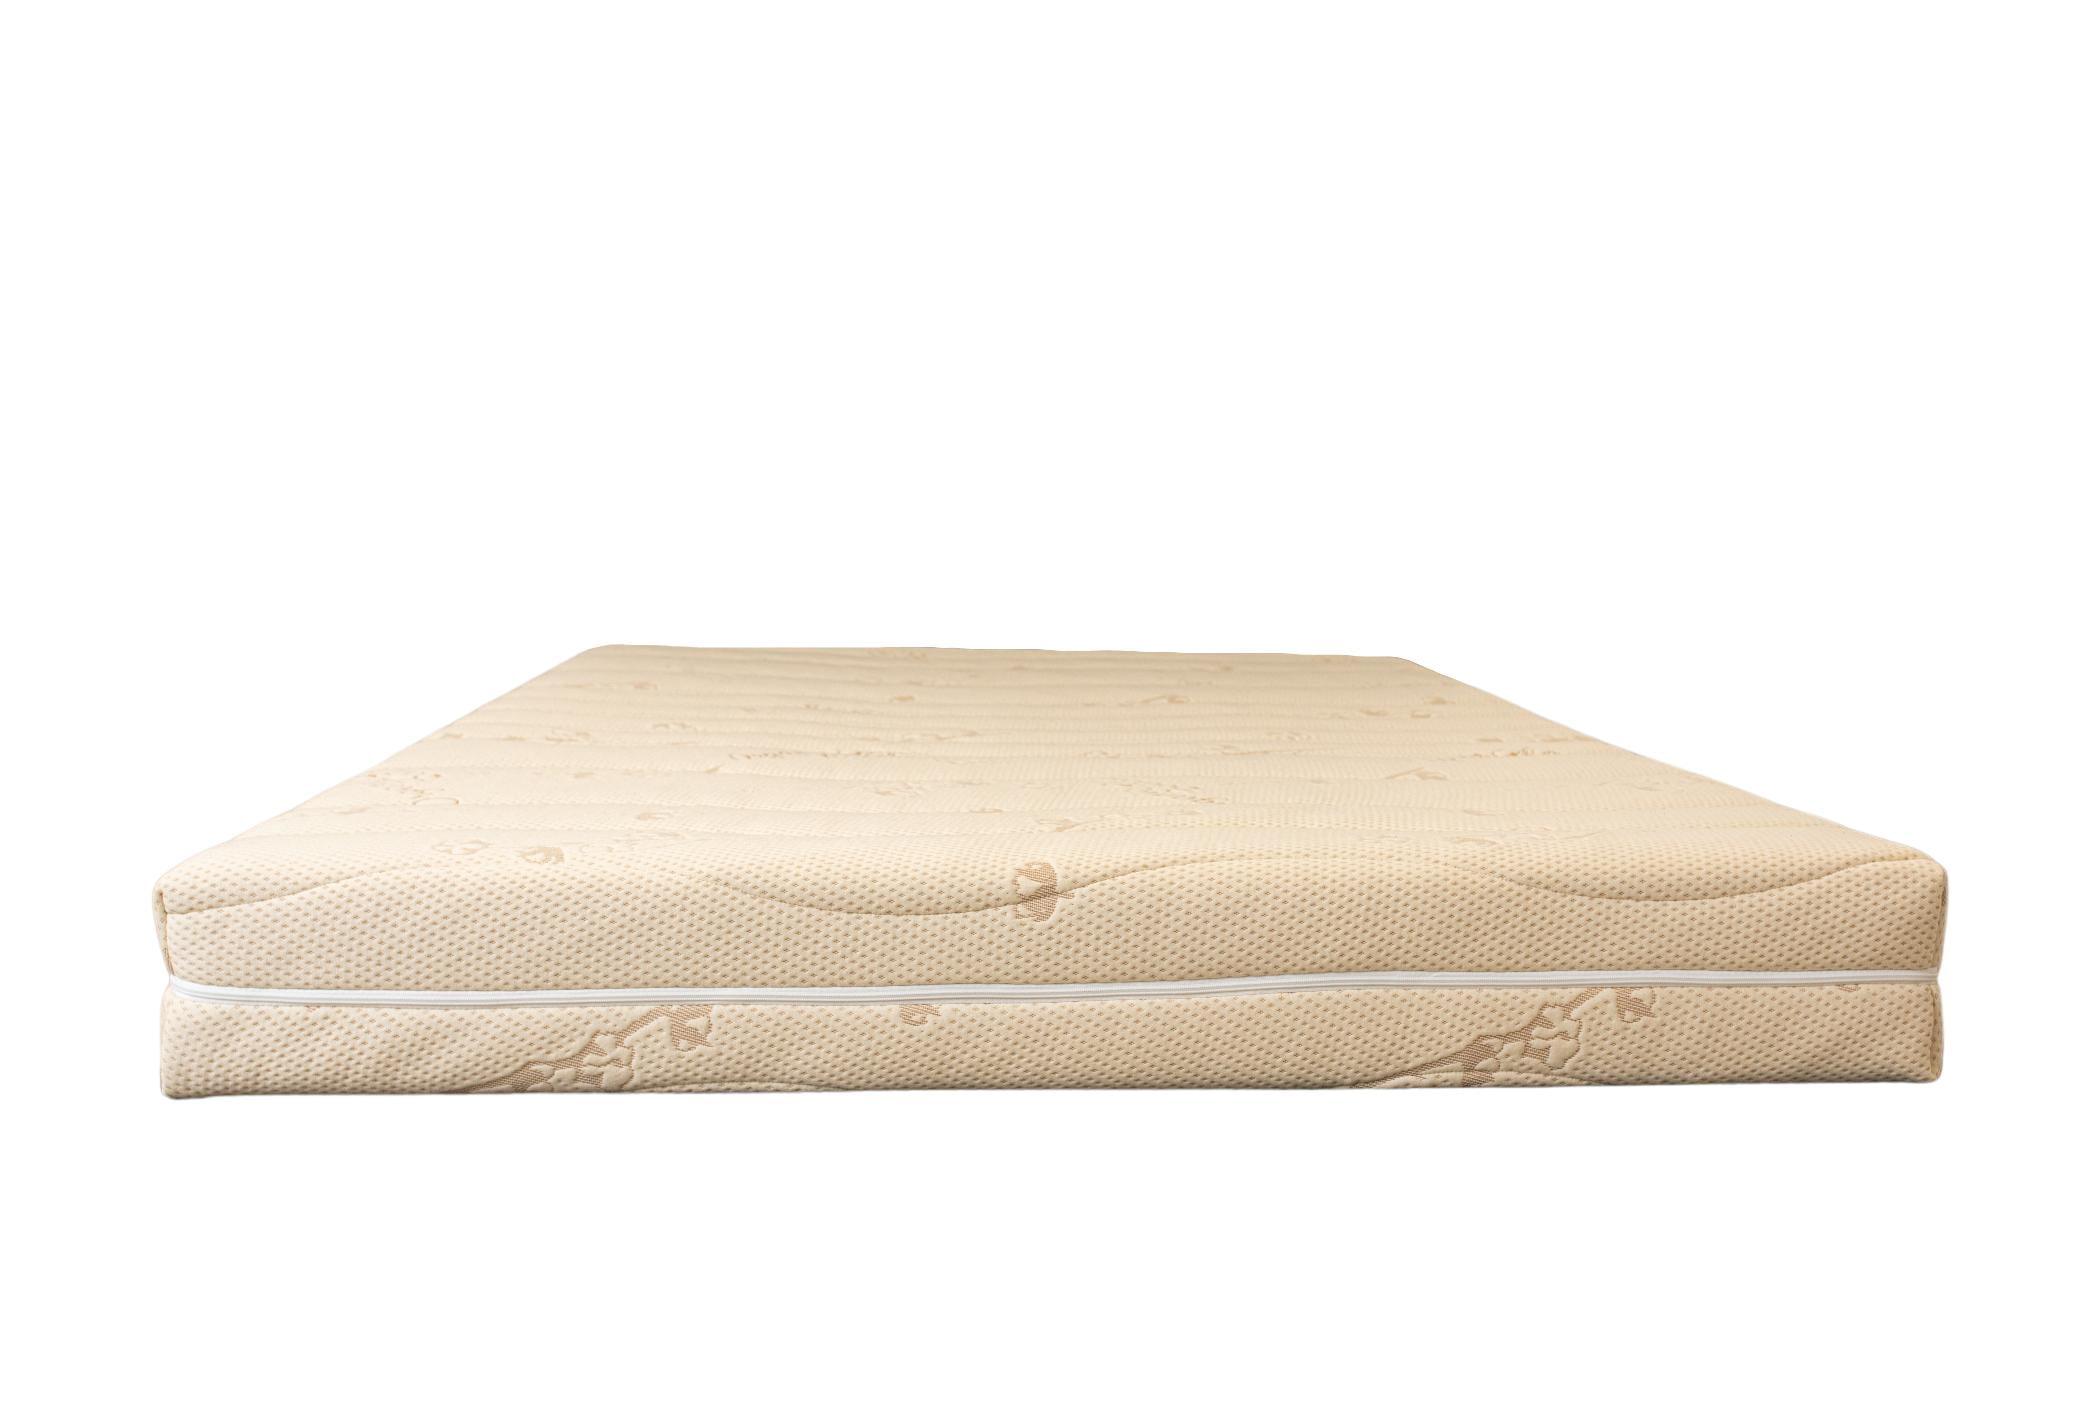 Saltea ortopedica Somnart Ortopedic Bio Cotton 160x200x17cm spuma poliuretanica, husa bumbac organic detasabila si lavabila, fermitate medie poza somnart.ro